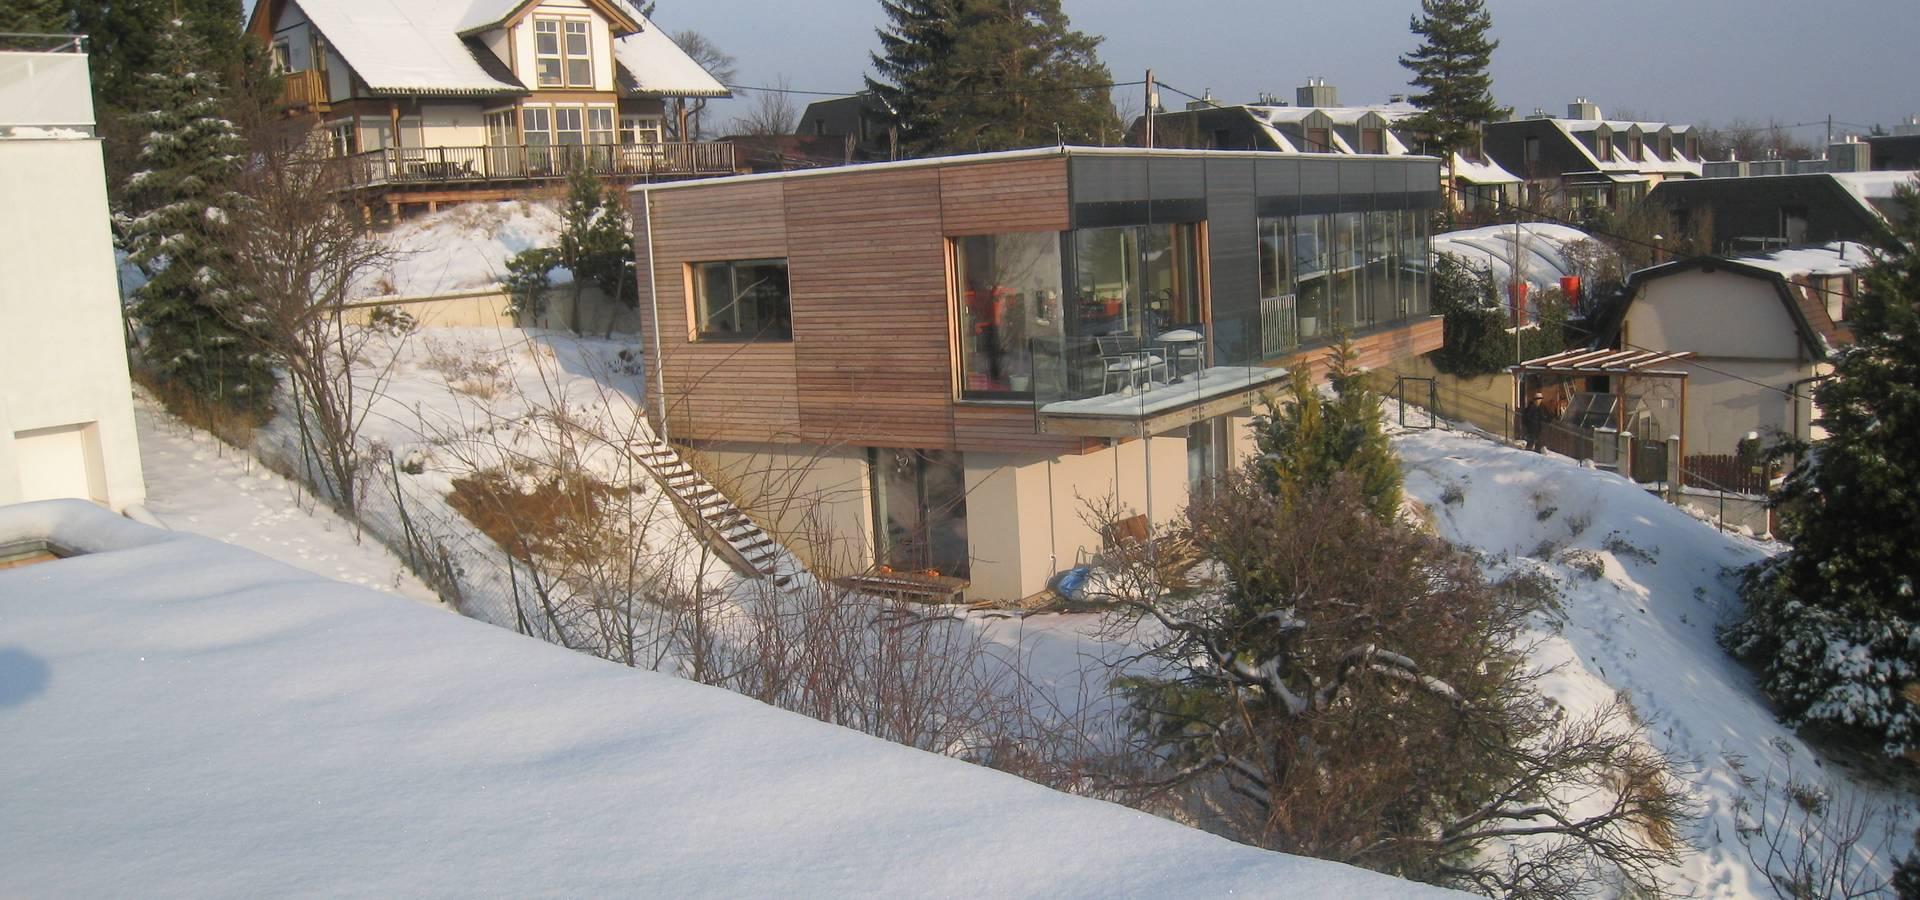 Architekturbüro Reinberg ZT GmbH